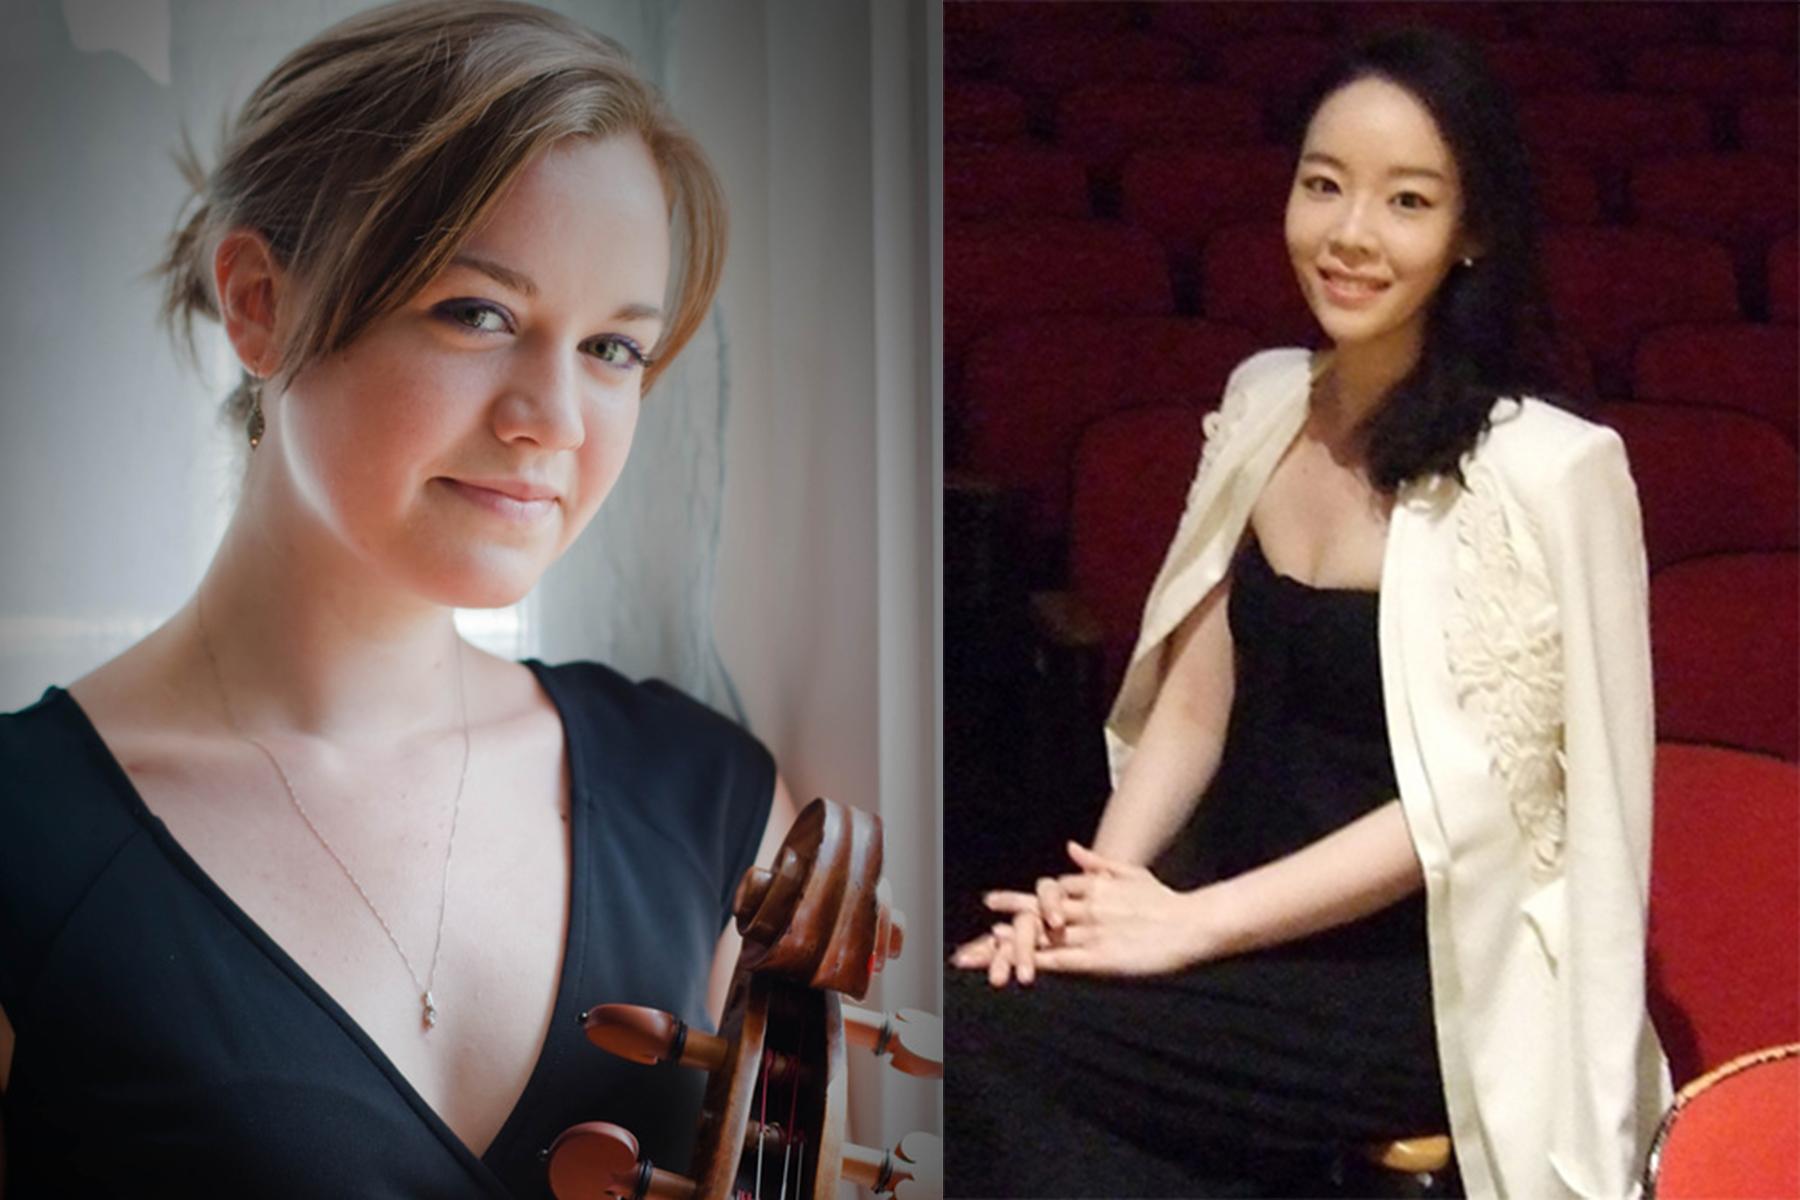 Dame Myra Hess Memorial Concerts | Cora Swenson Lee, Cello And Claire-chung Lim, Piano